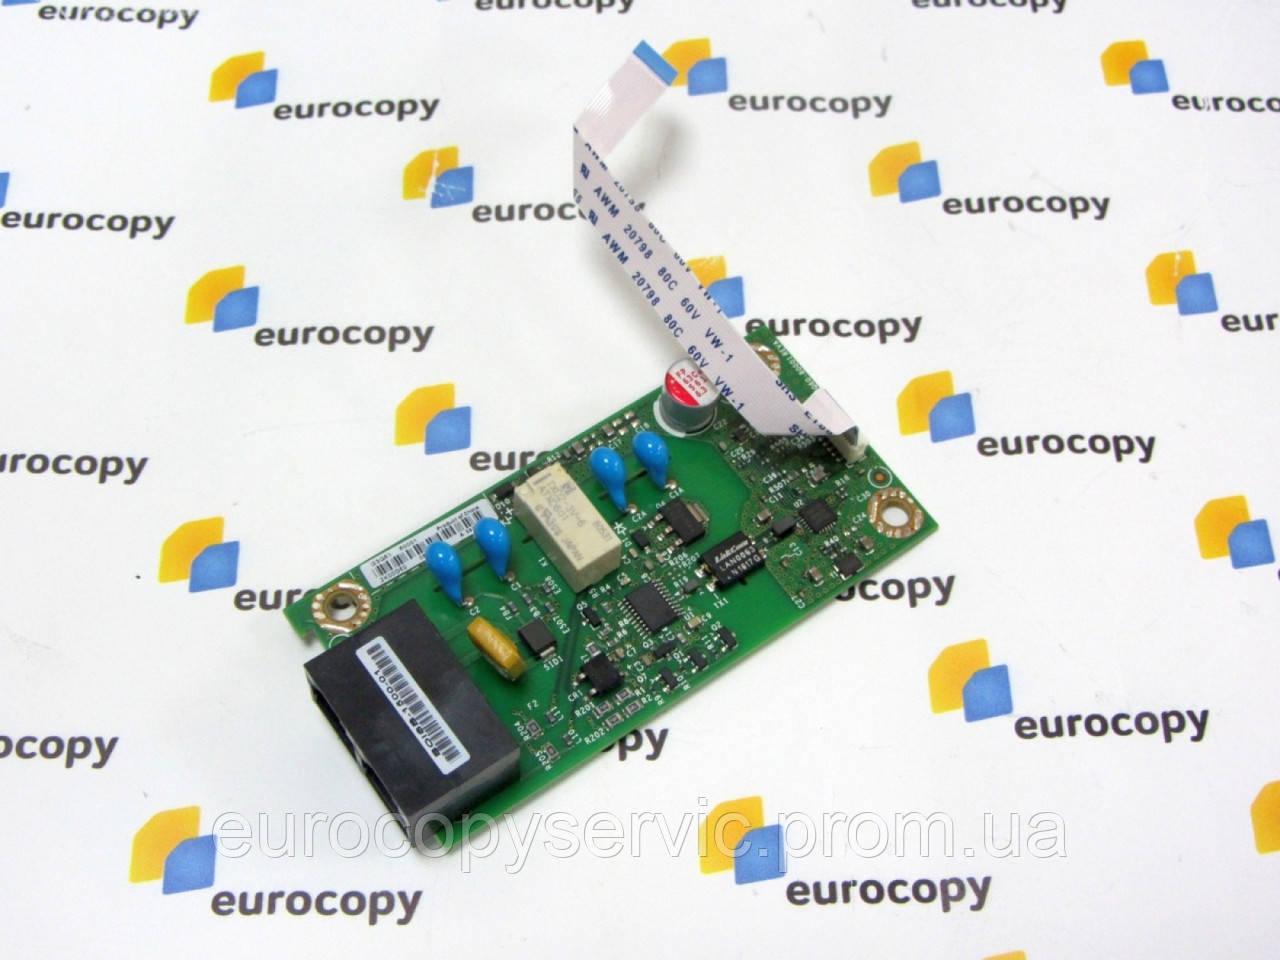 Плата для моделей з факсом HP LJ M101 / M102 / M103 / M104 / M106 / M129 / M130 / M131 / M132 / M133 / M134 /